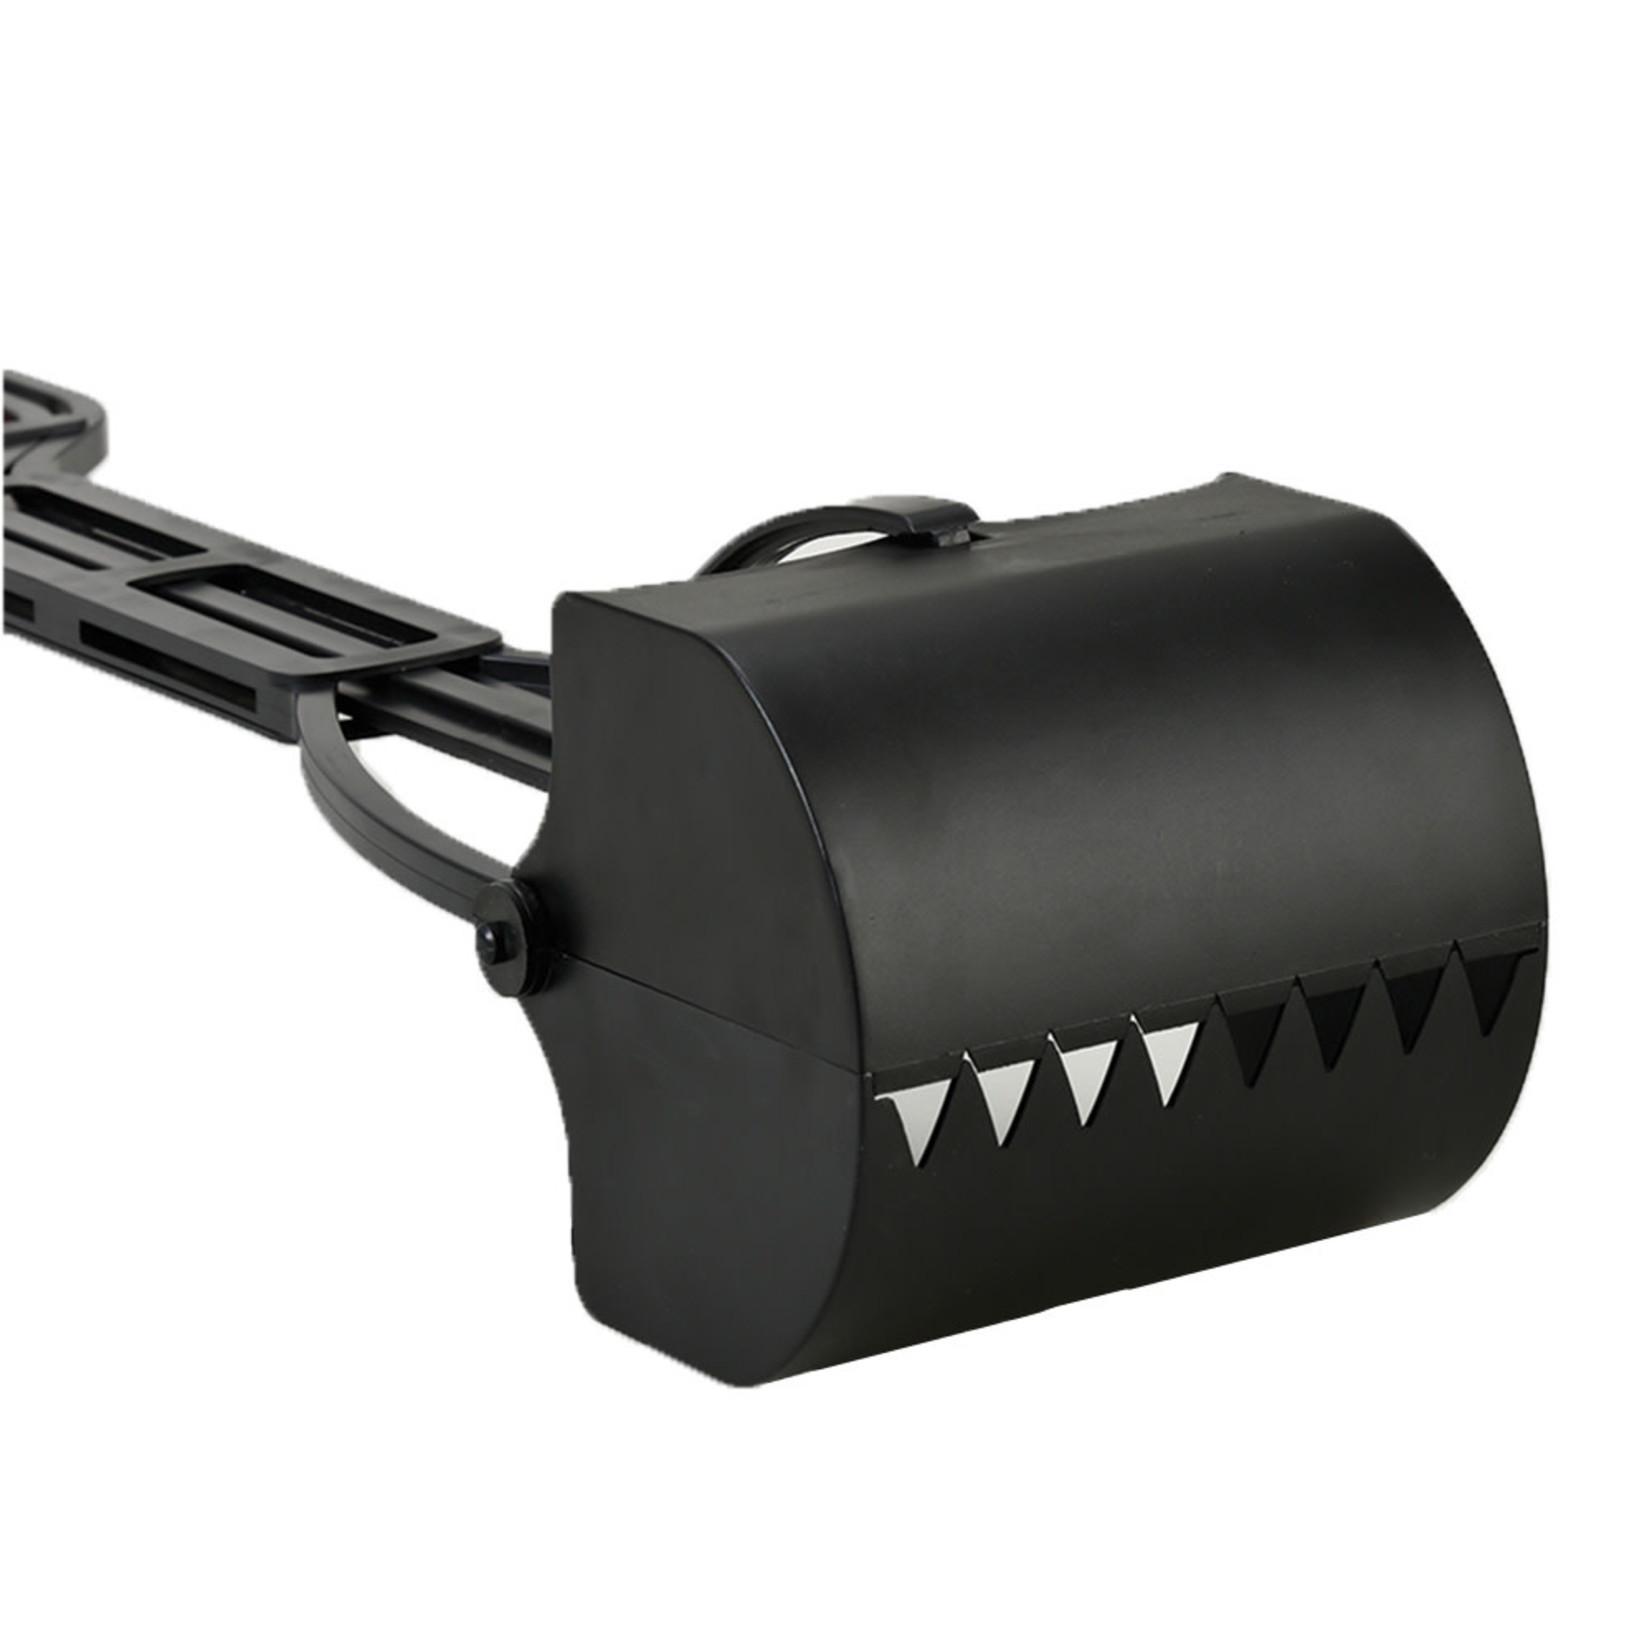 Plastic Scoop Rake Black 25in